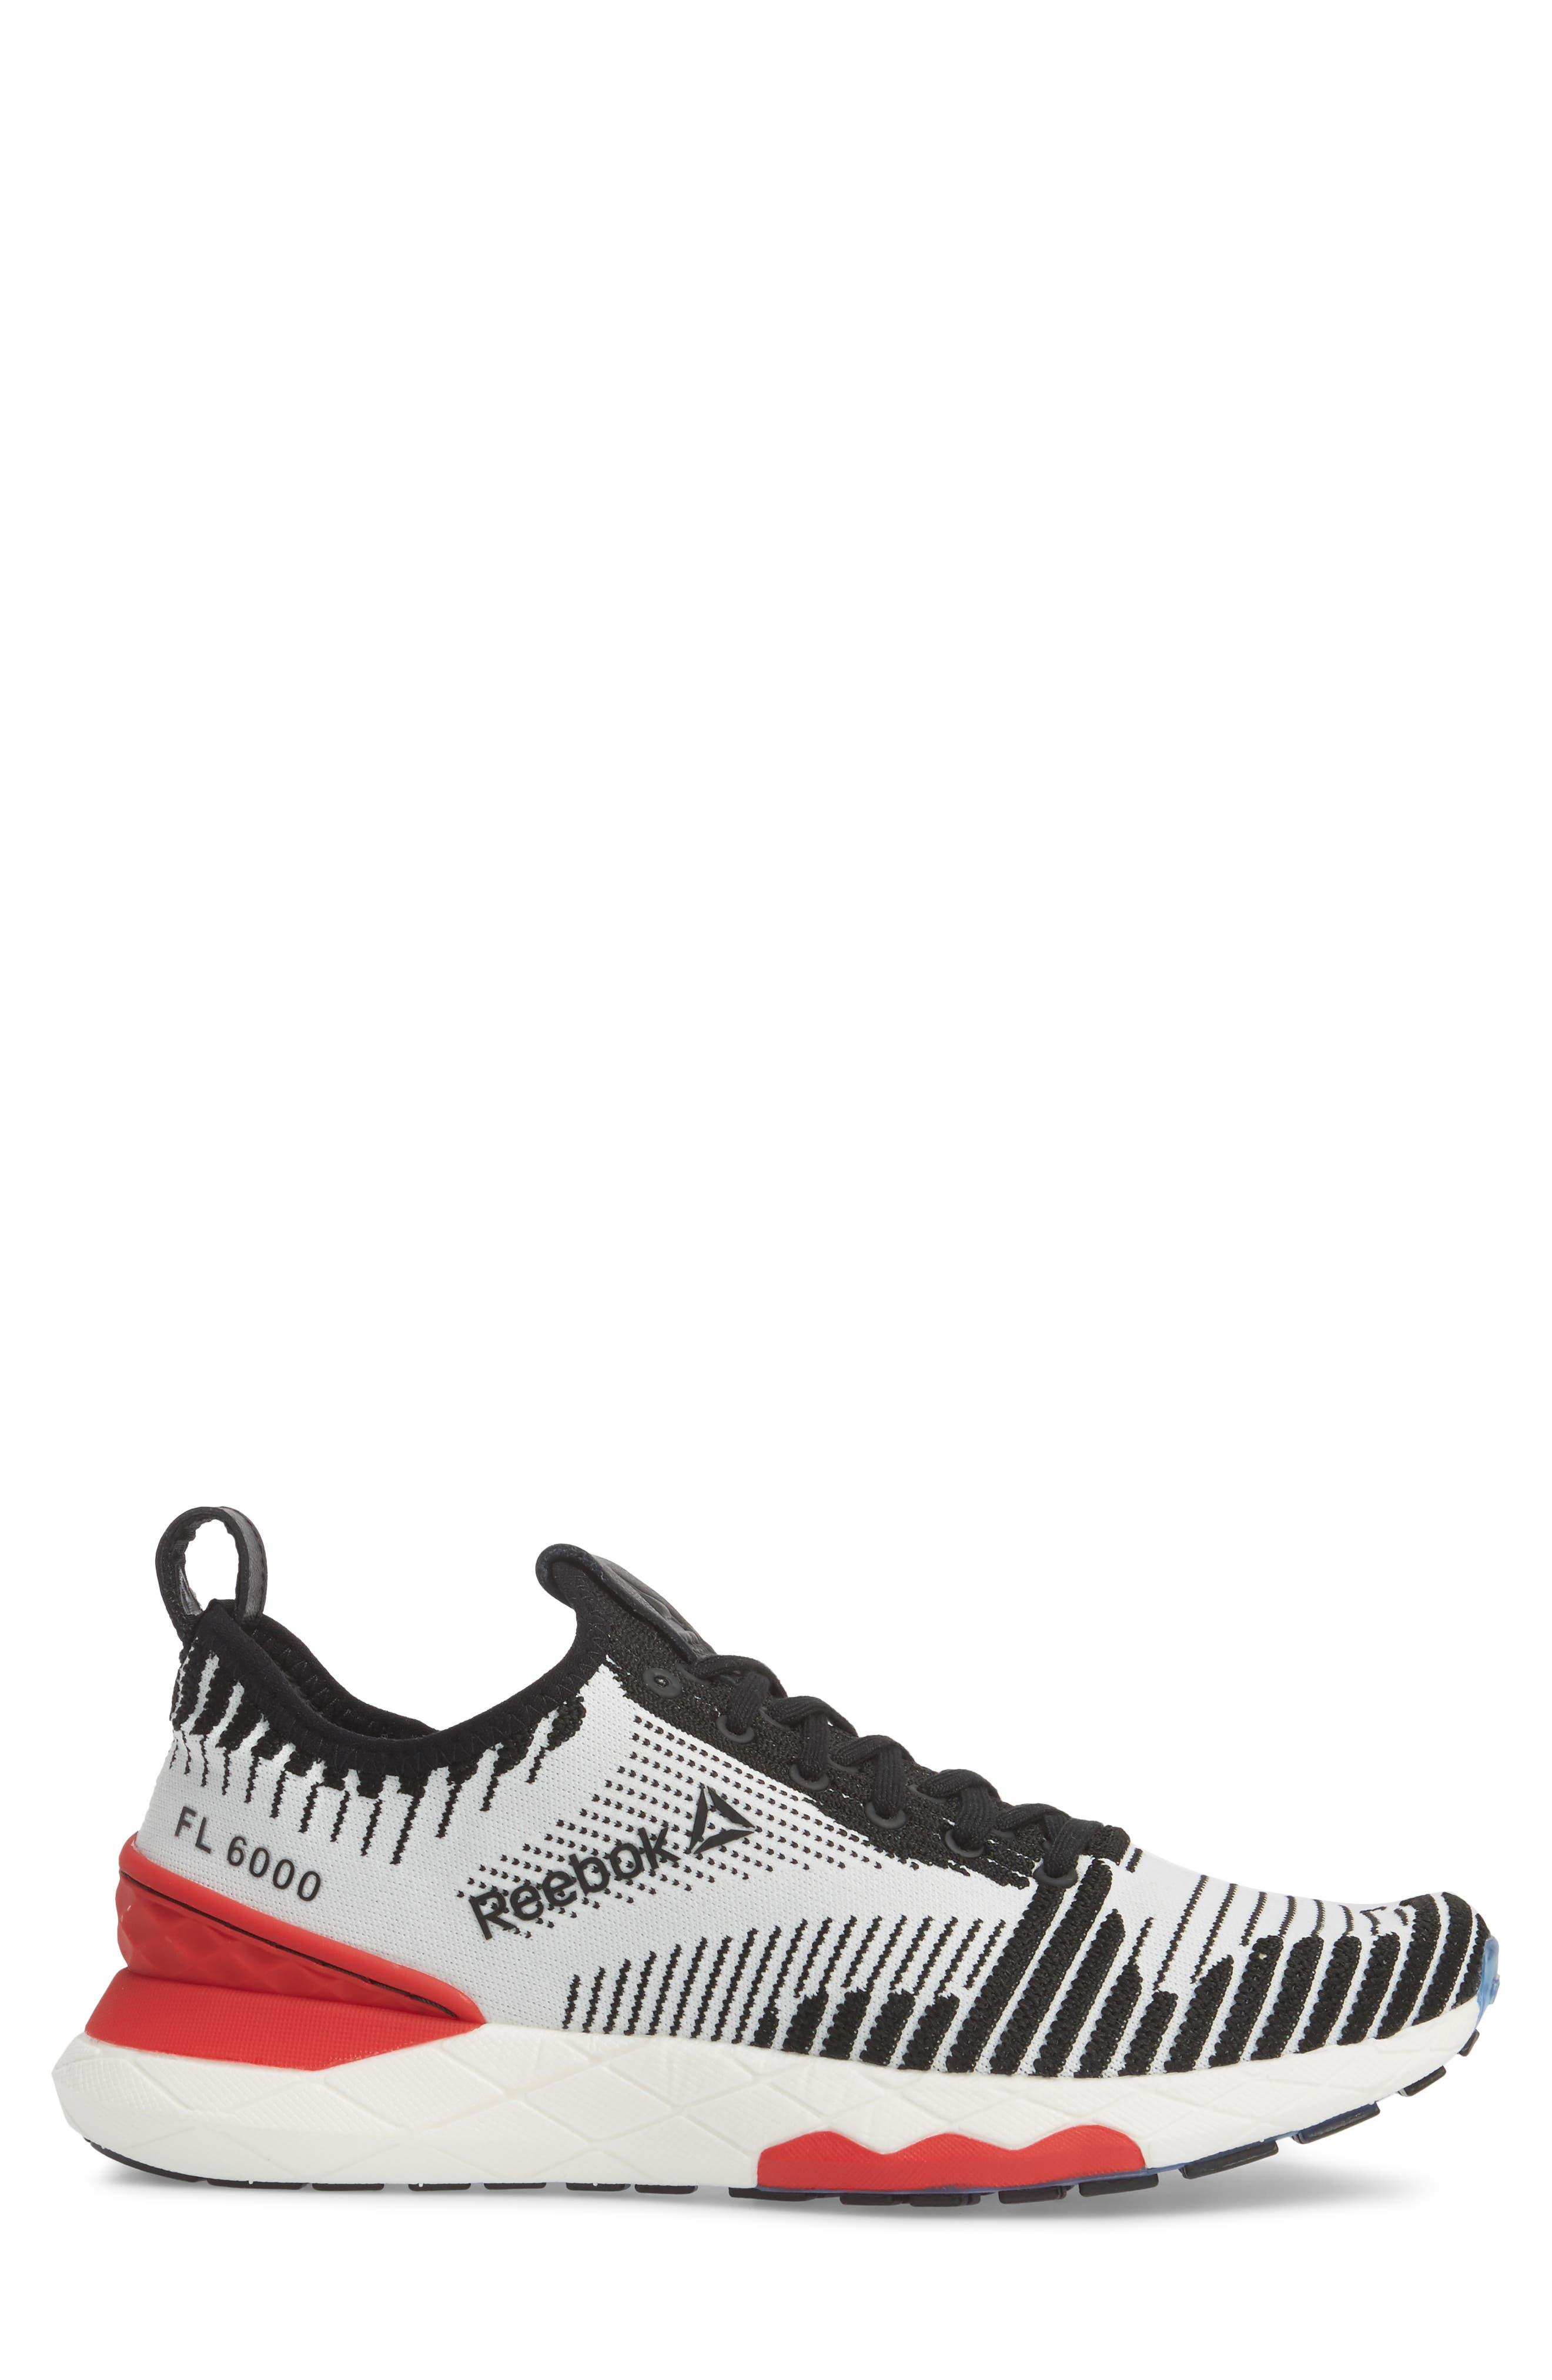 Floatride Run 6000 Running Shoe,                             Alternate thumbnail 3, color,                             001